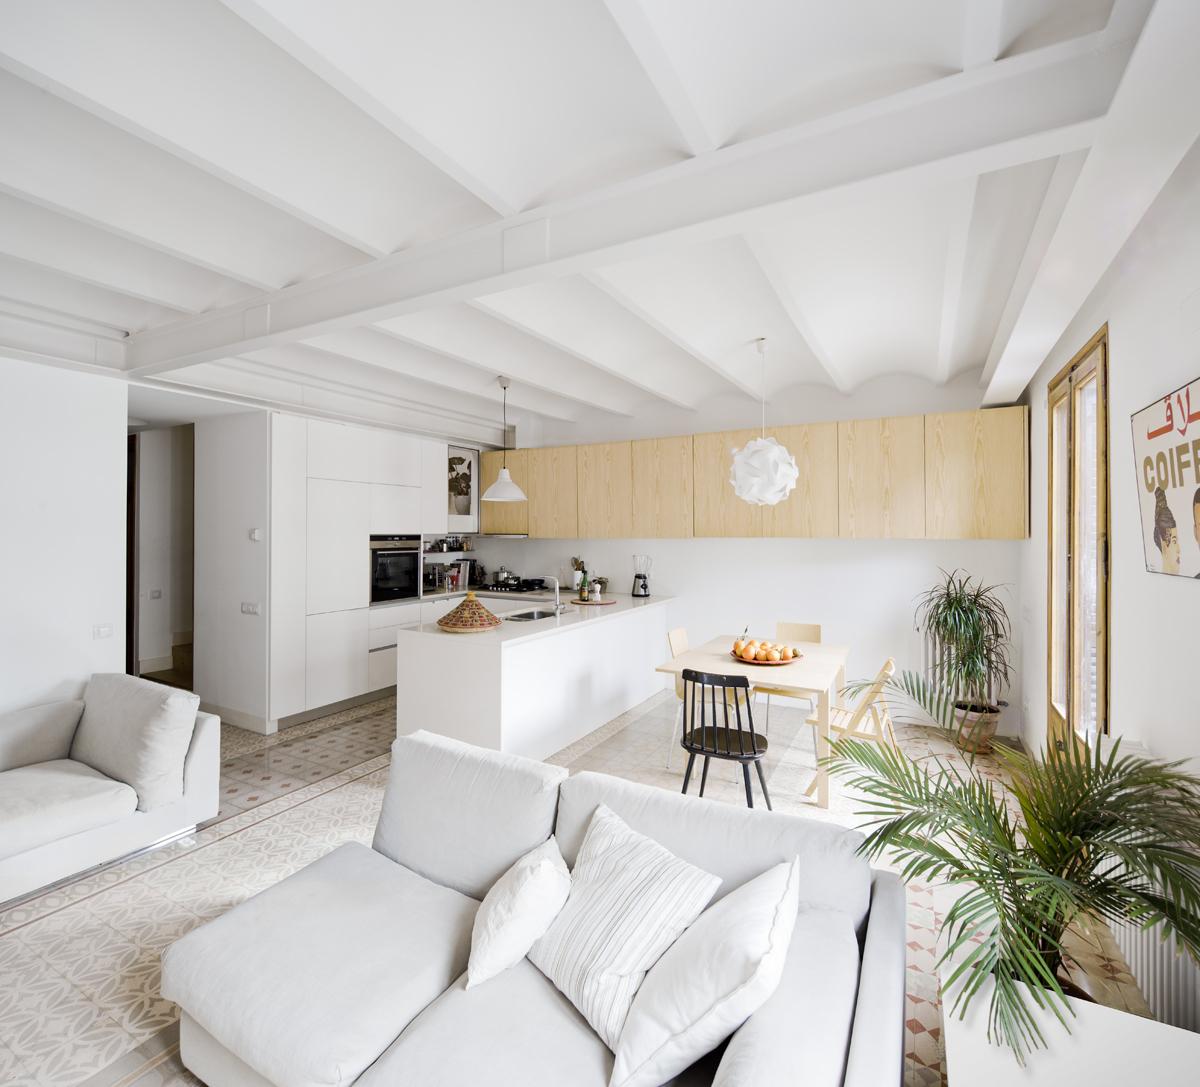 52c212d3e8e44eb764000097_apartment-refurbishment-anna-eugeni-bach_003_a_eb_urgell.jpg